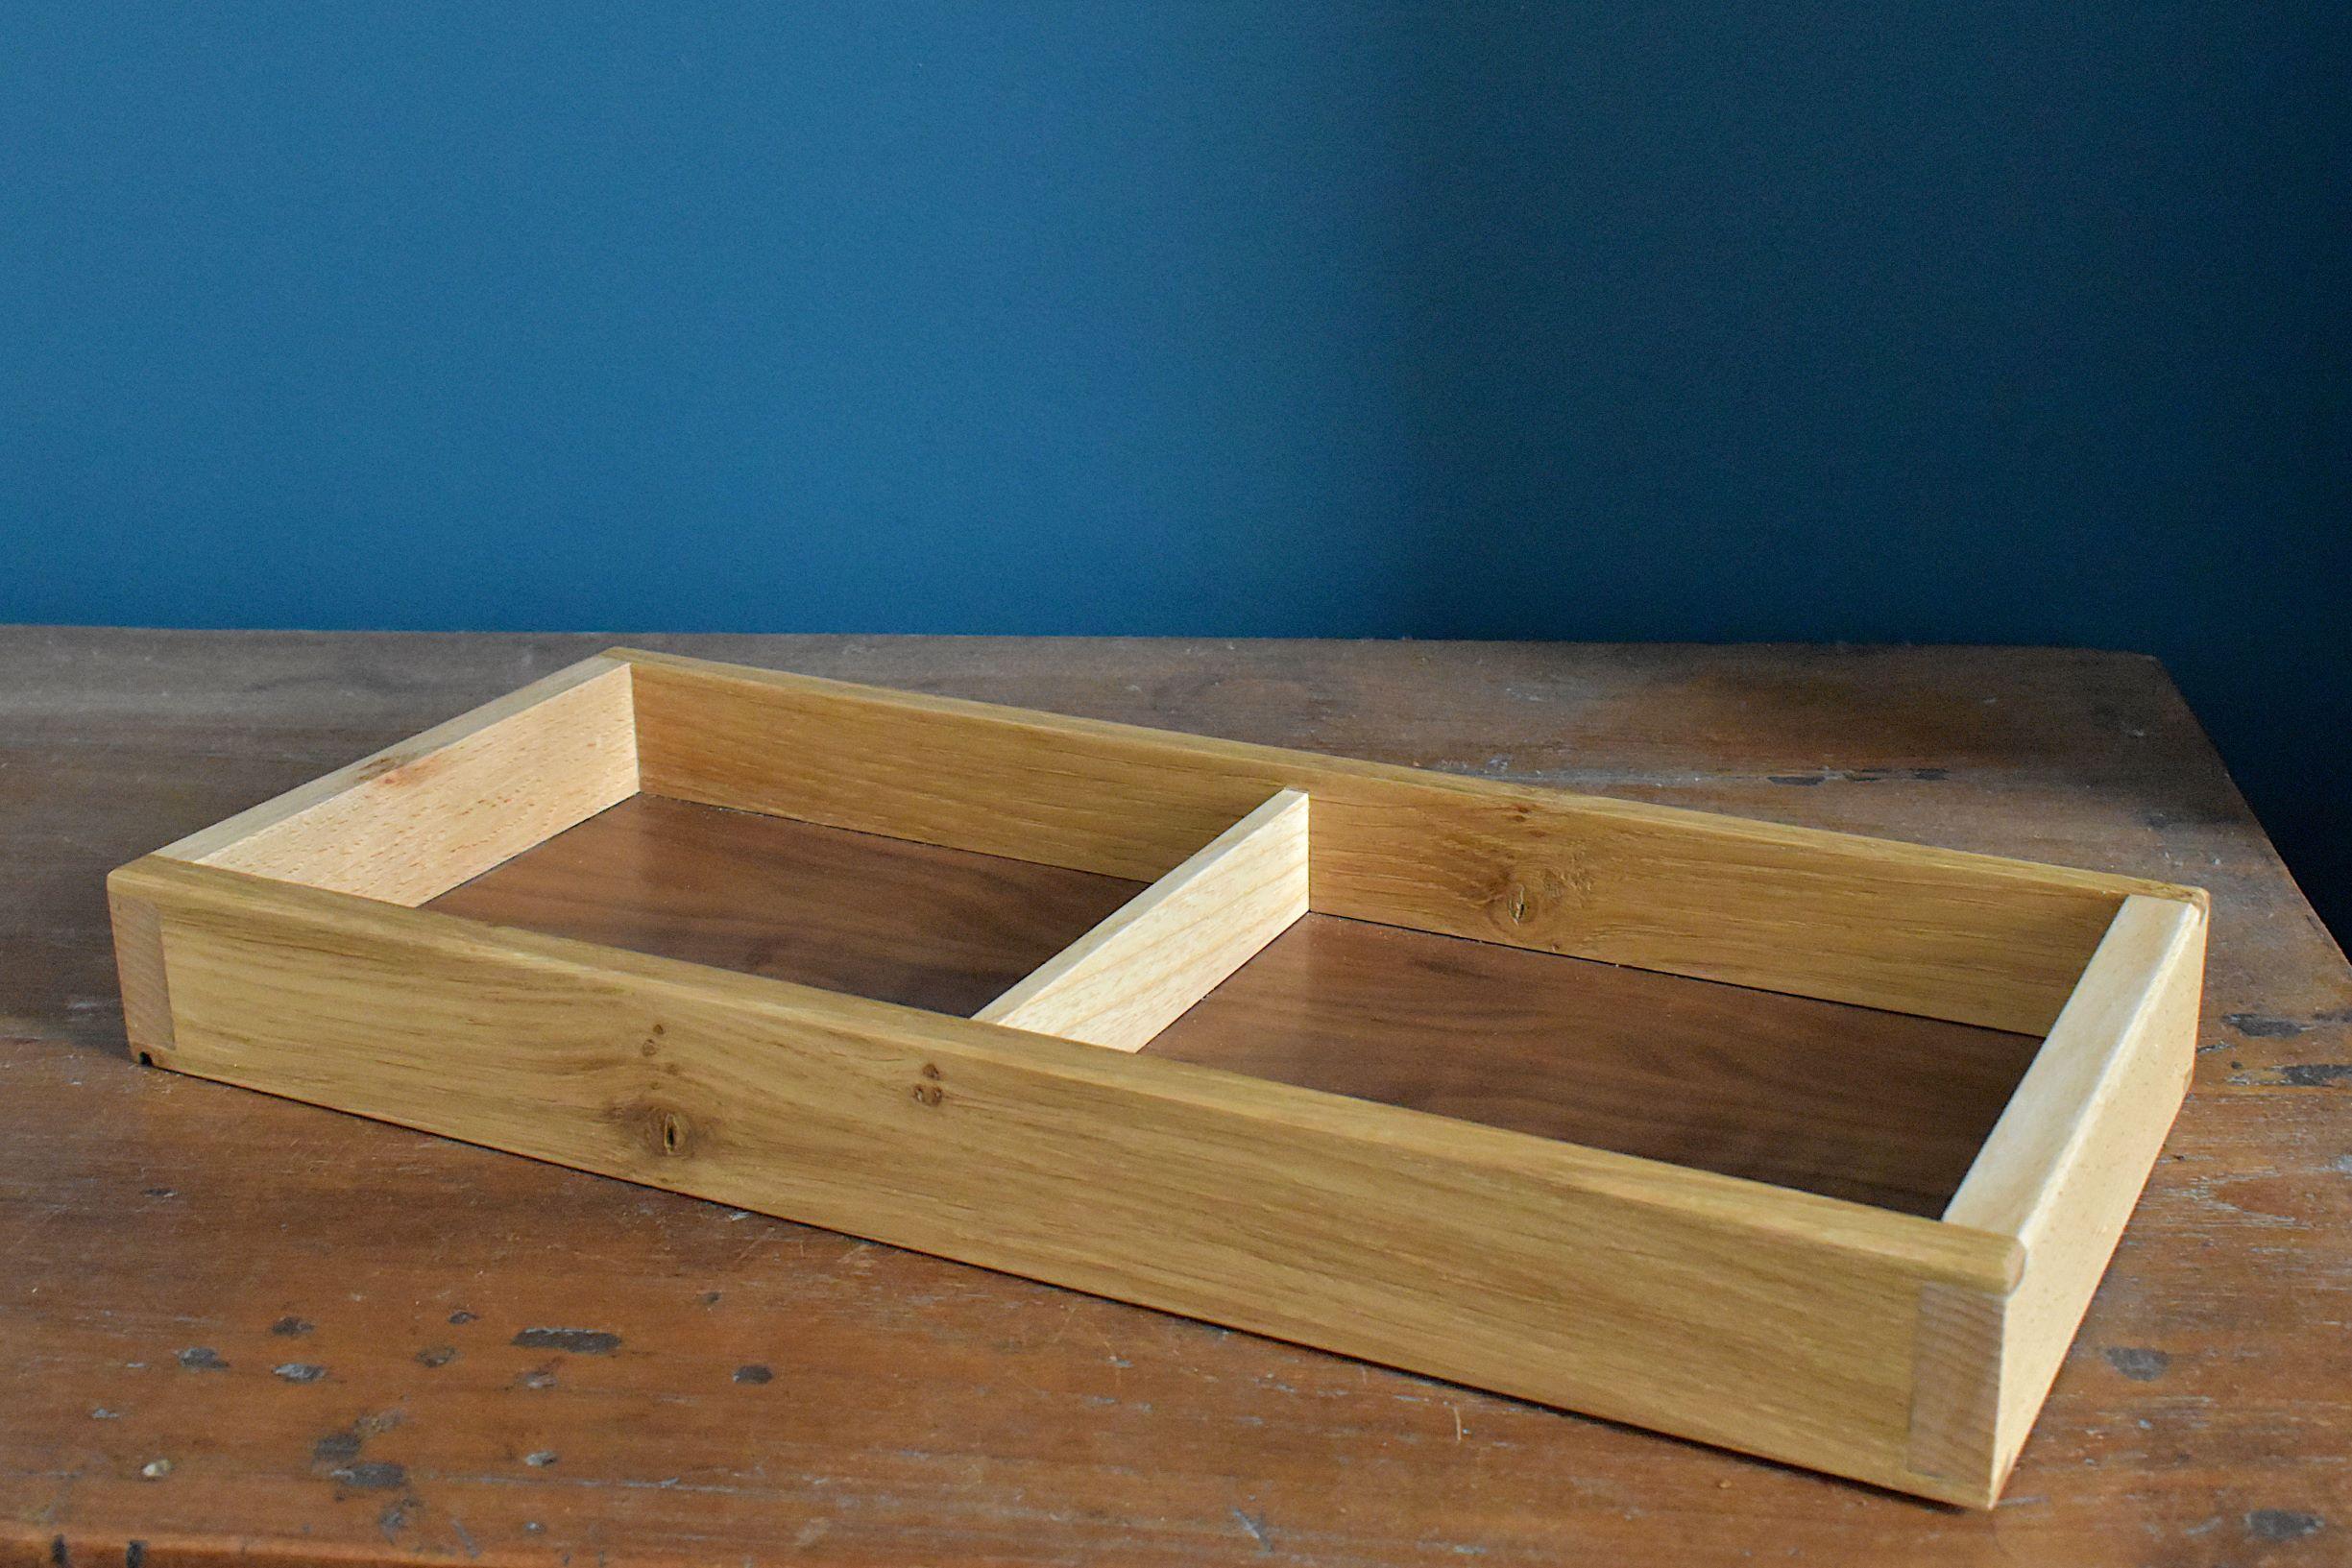 oak, beech and walnut divided tray/organiser